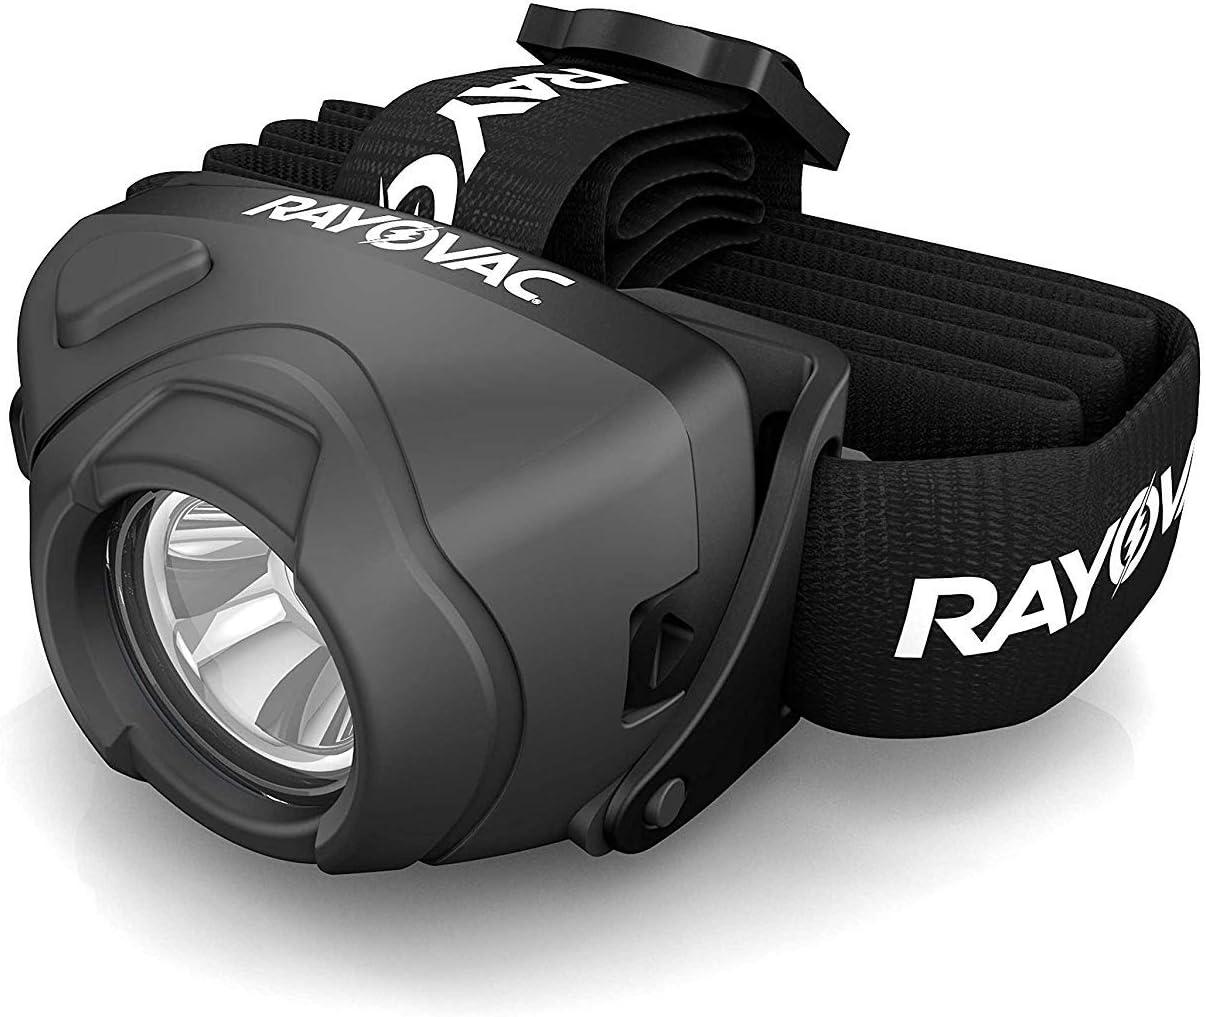 Headlamp LED Flashlight Rayovac Virtually Indestructible Headlight Safety Camp